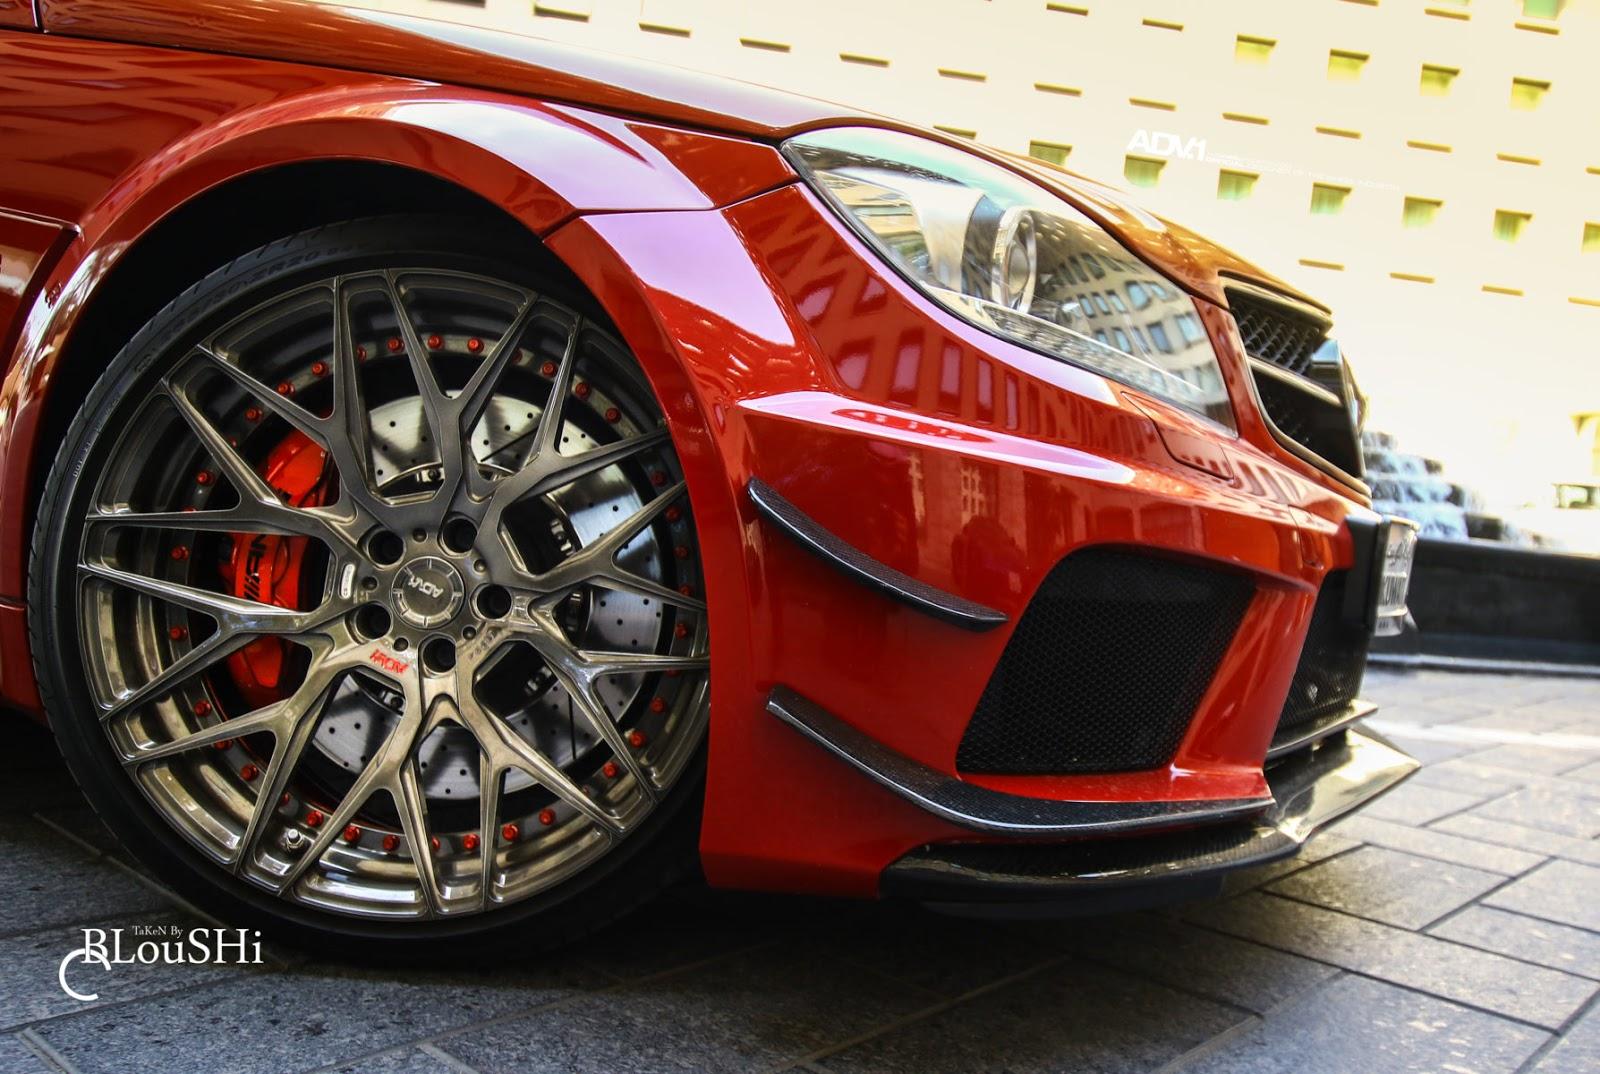 All Types amg black series wheels : 2013 Mercedes-Benz C63 AMG Black Series ADV10.0 M.V2 Wheels ...